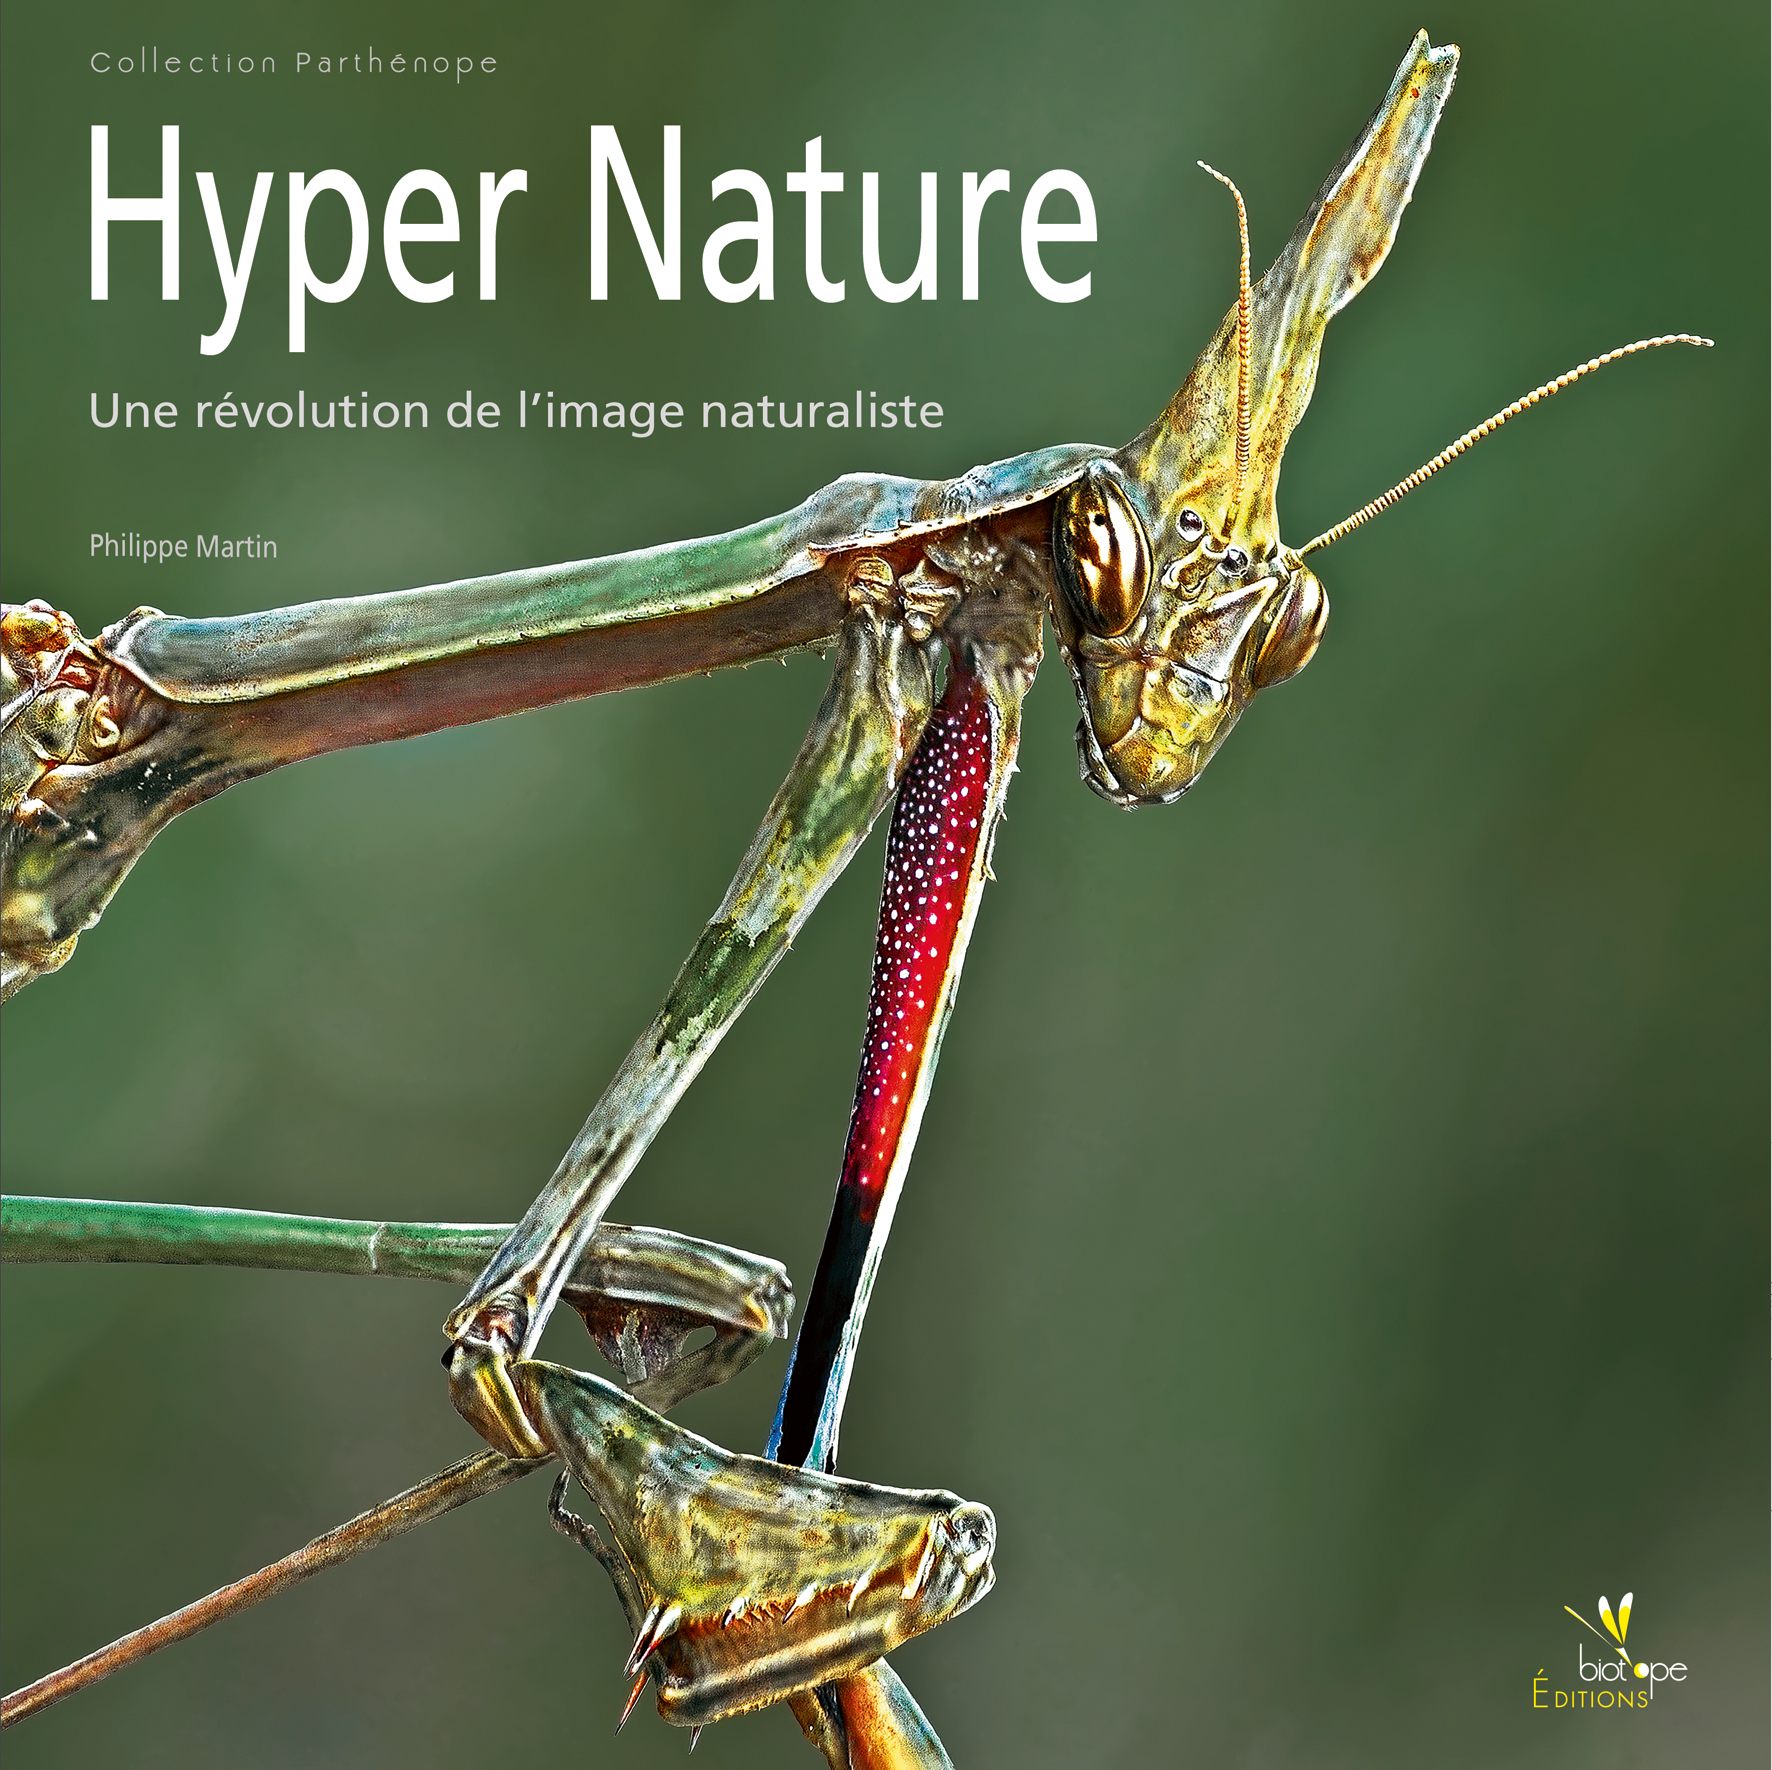 HYPER NATURE. UNE REVOLUTION DE L'IMAGE NATURALISTE. JUILLET2008-JUILLET 2011.